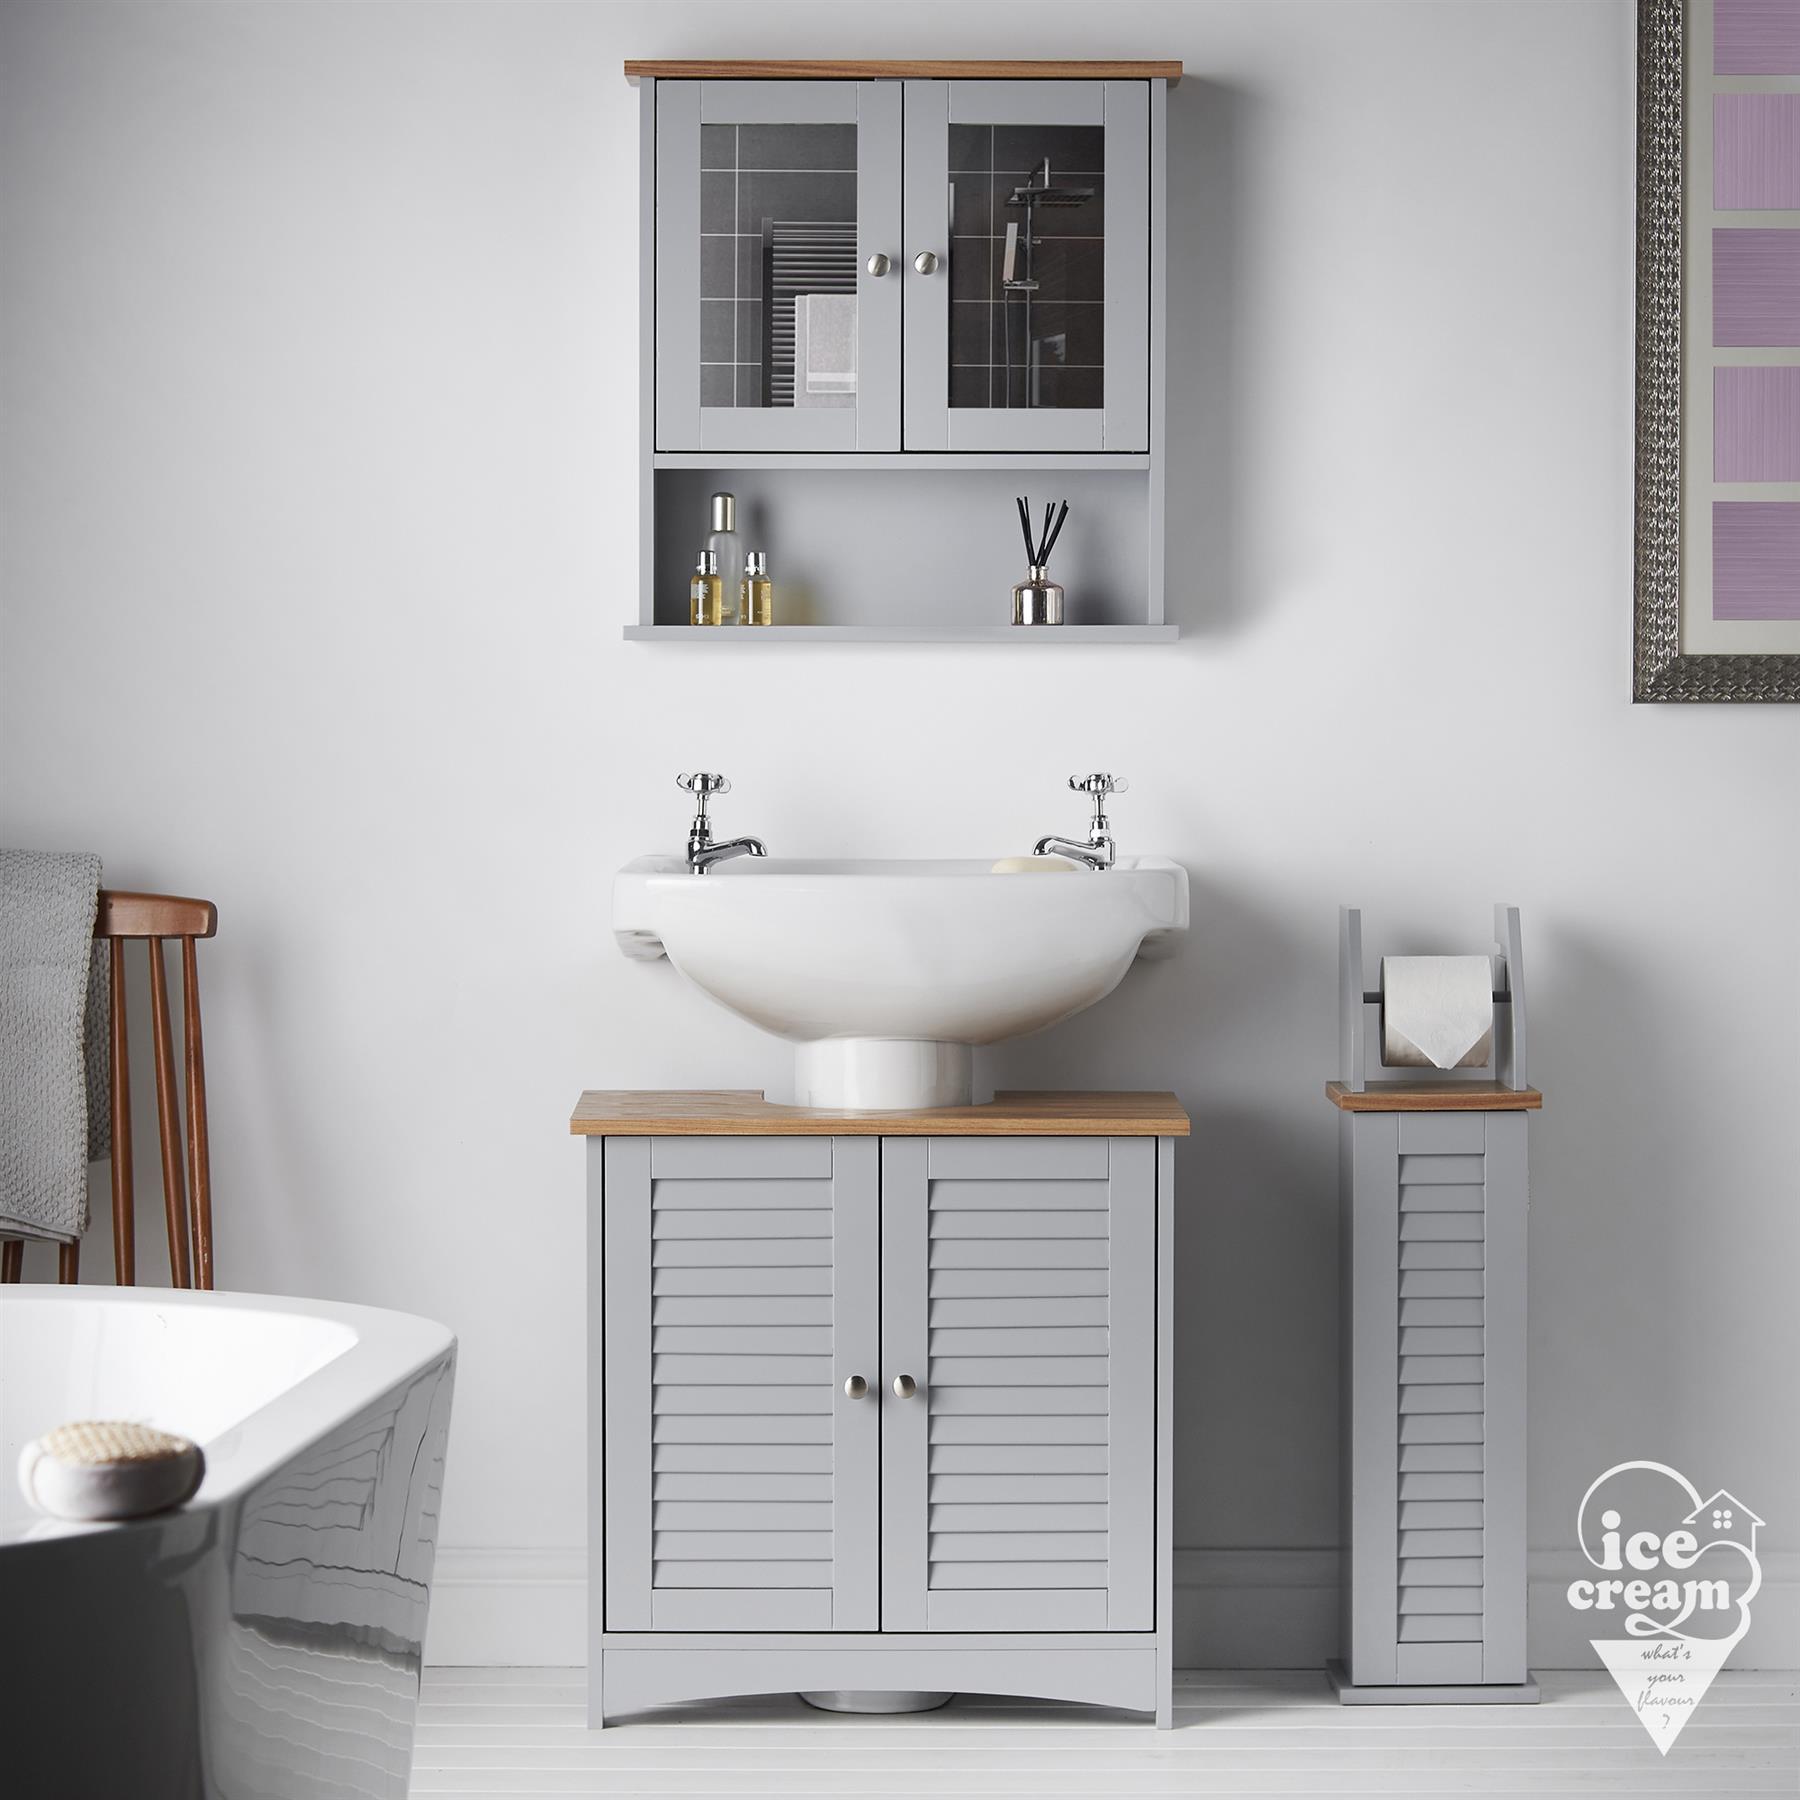 Grey Bathroom Furniture 3 Piece Set Mirrored Cabinet Vanity Unit Floor Storage 5060635721324 Ebay